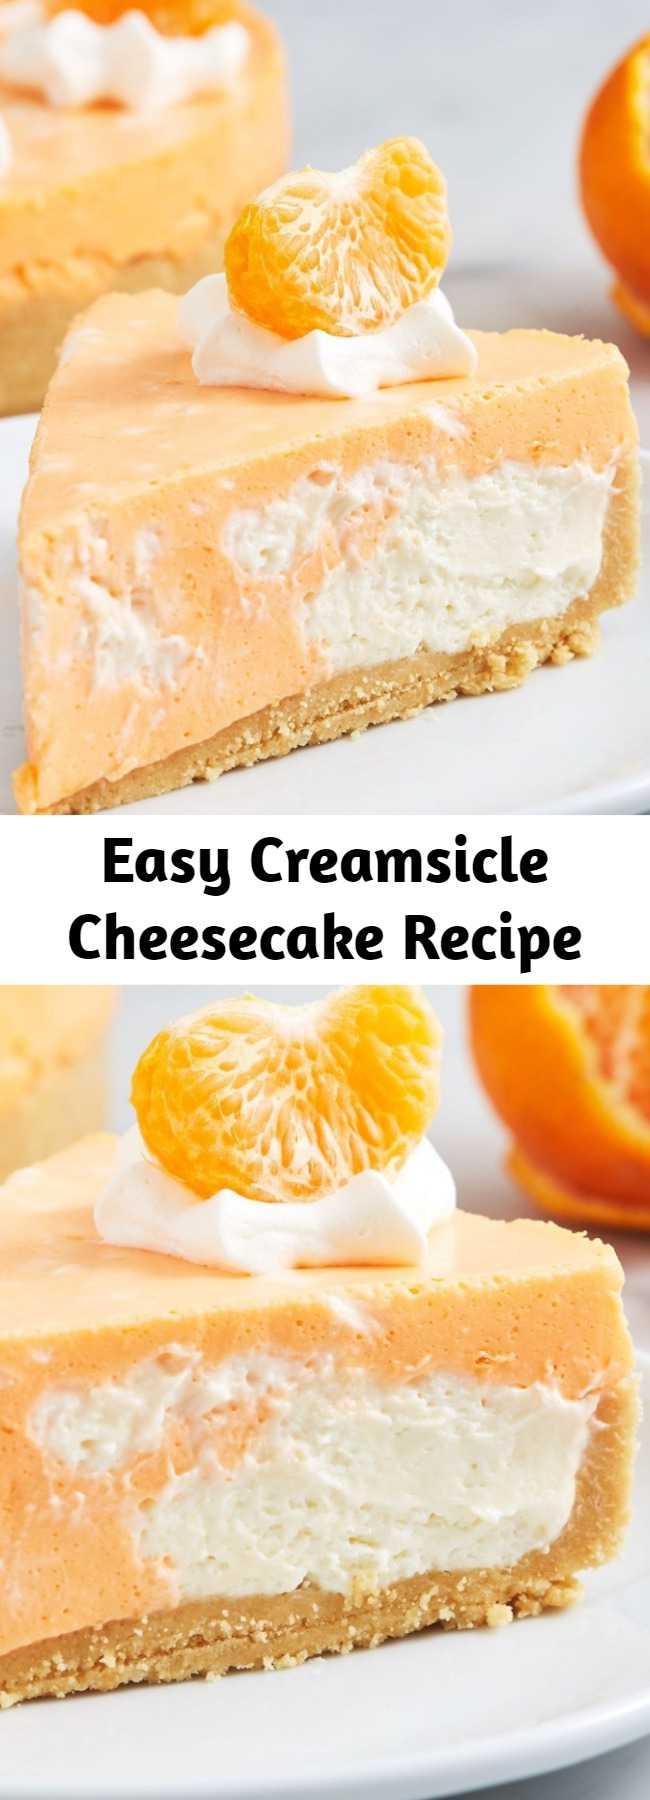 Easy Creamsicle Cheesecake Recipe - This no-bake Creamsicle Cheesecake is perfect for hot summer days.